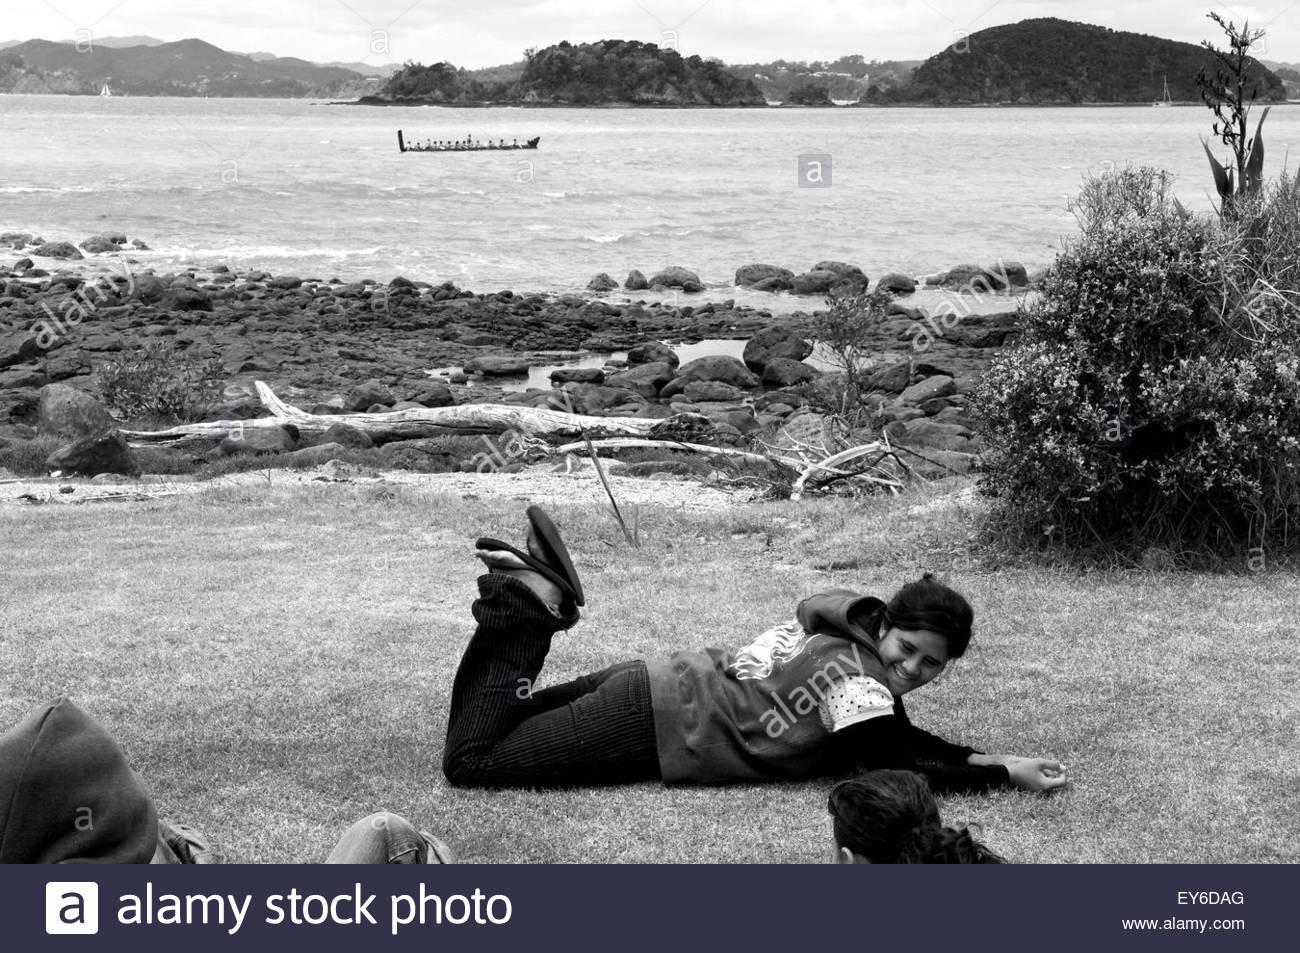 In the distance, a waka (traditional Maori canoe) participates in Waitangi Day annual commemorations on Waitangi - Stock Image